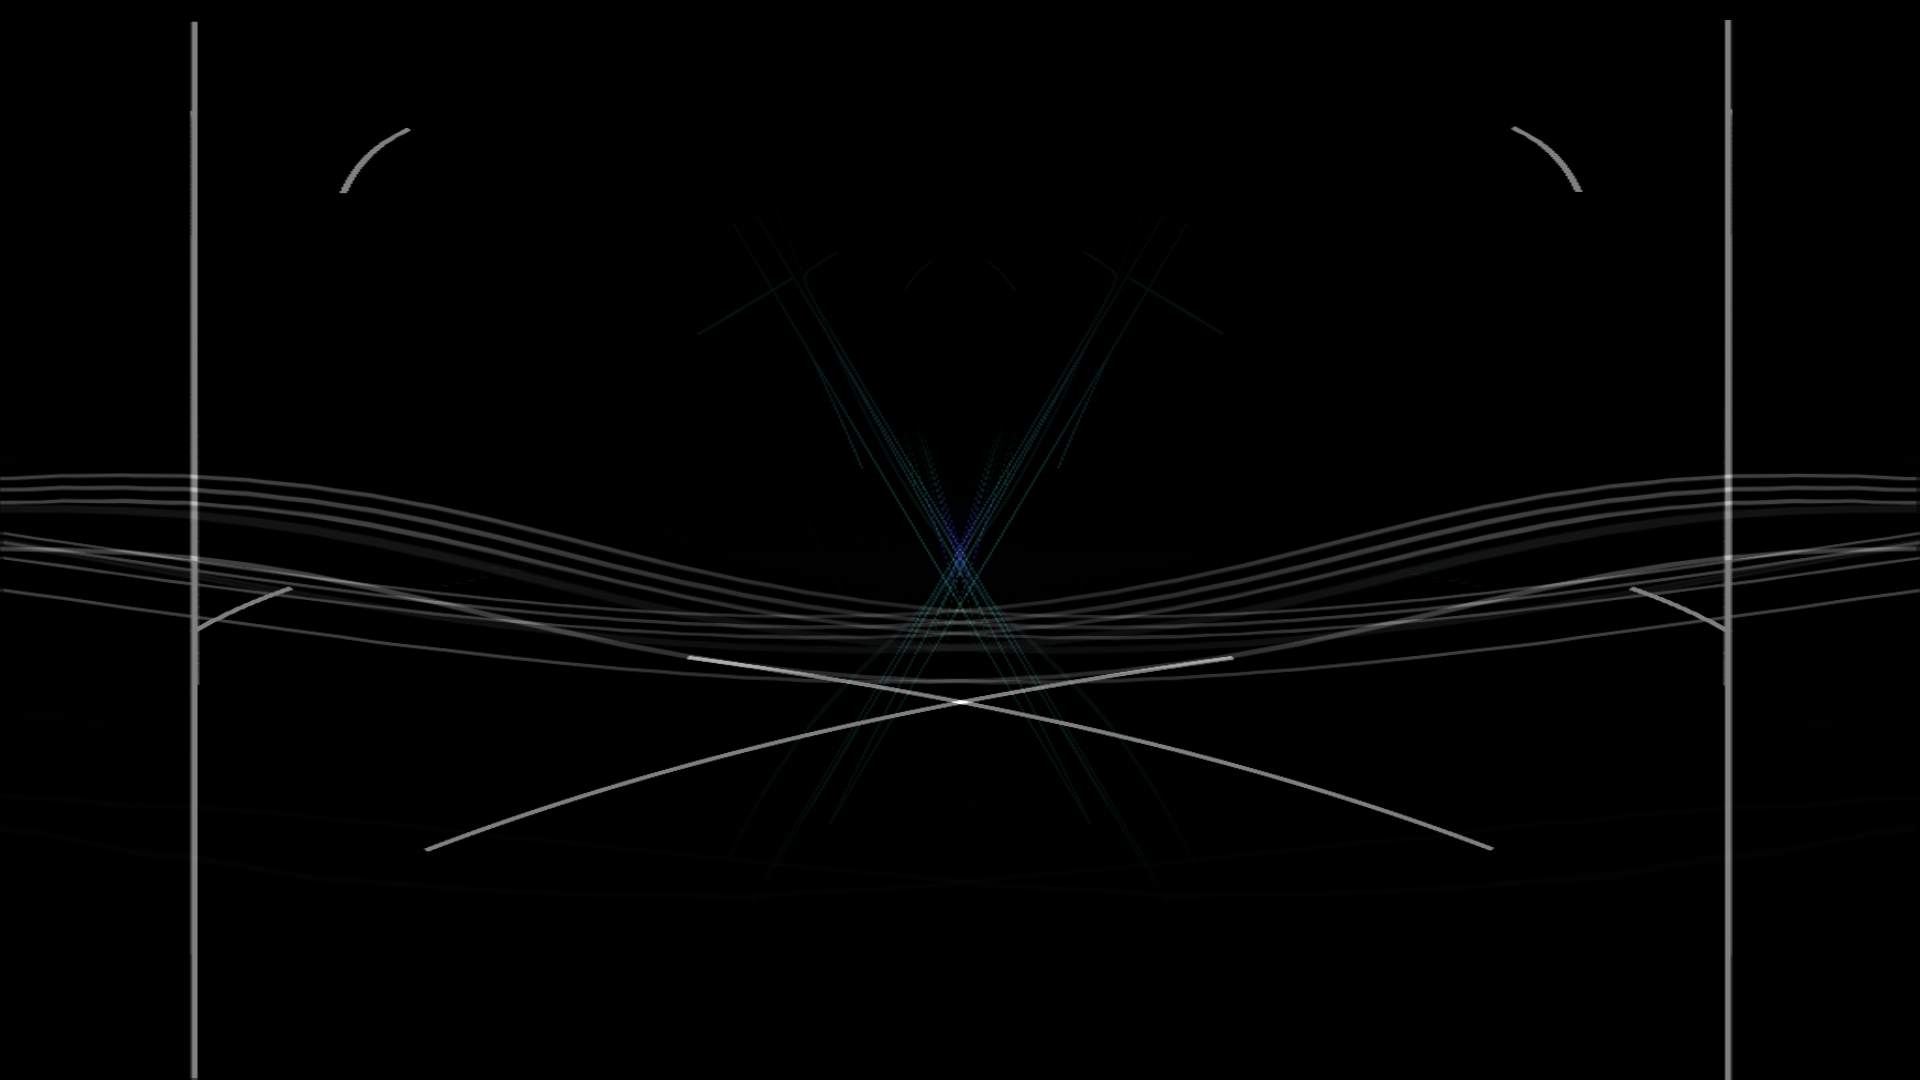 projectm-0219